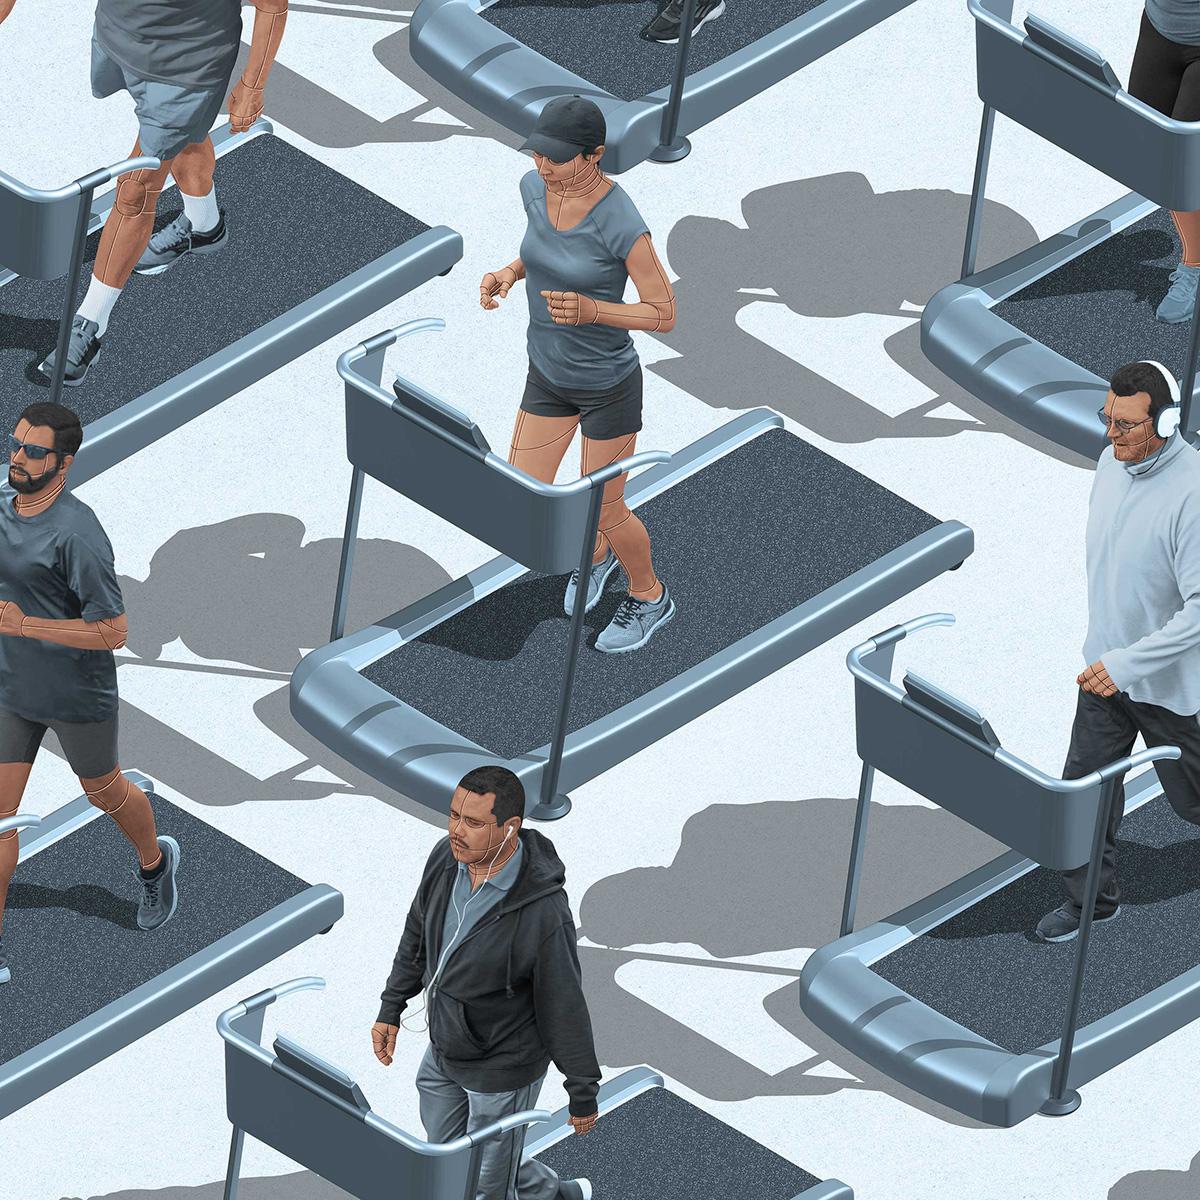 Sims-Like Digital Illustrations